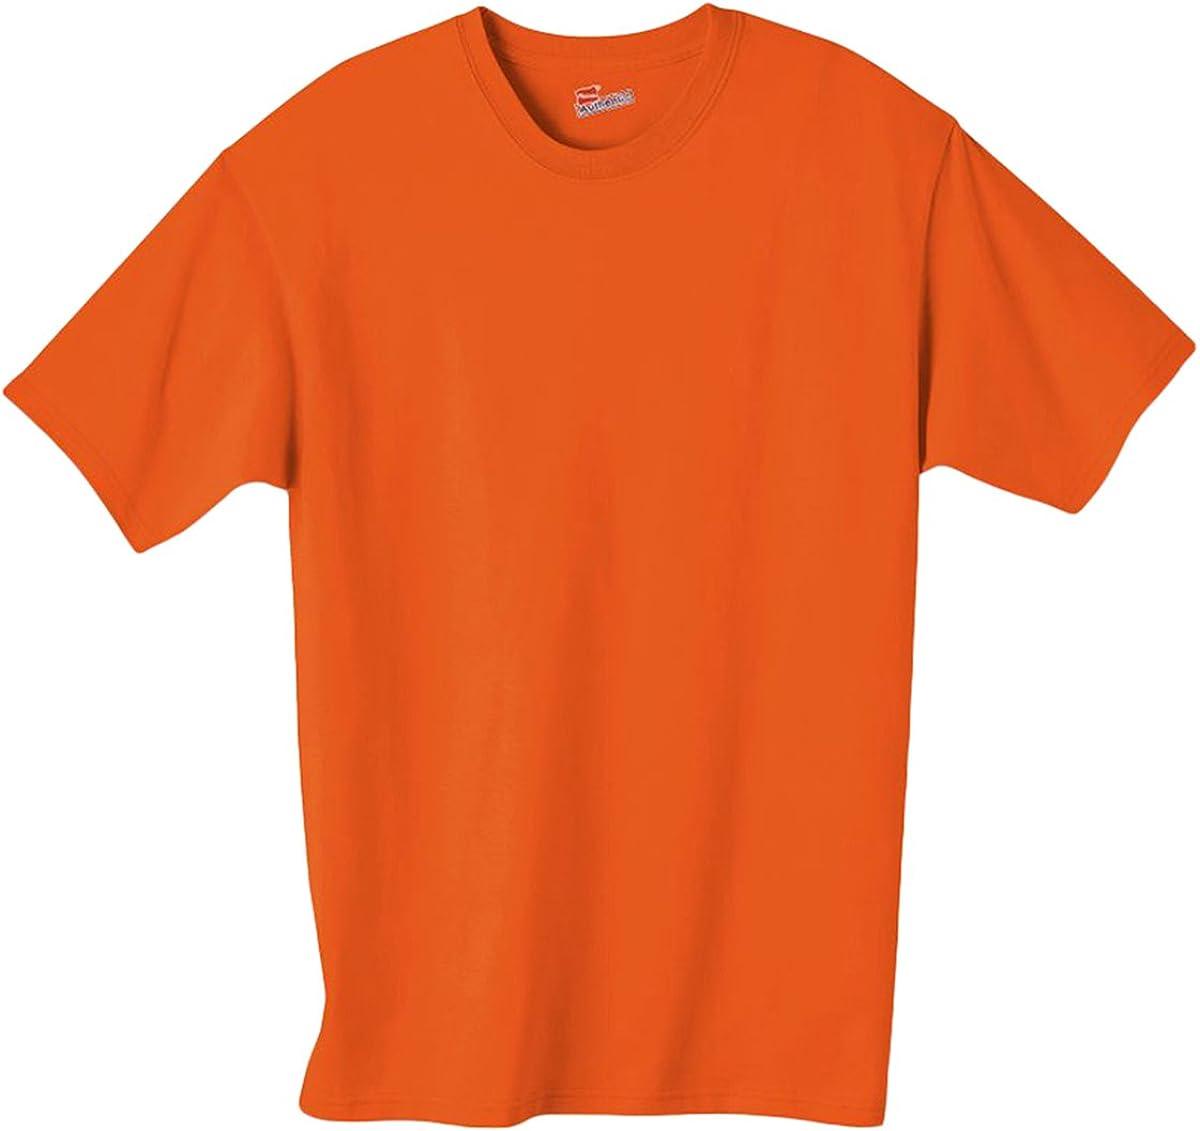 Hanes Authentic TAGLESS Boys' Cotton T-Shirt_Orange_S